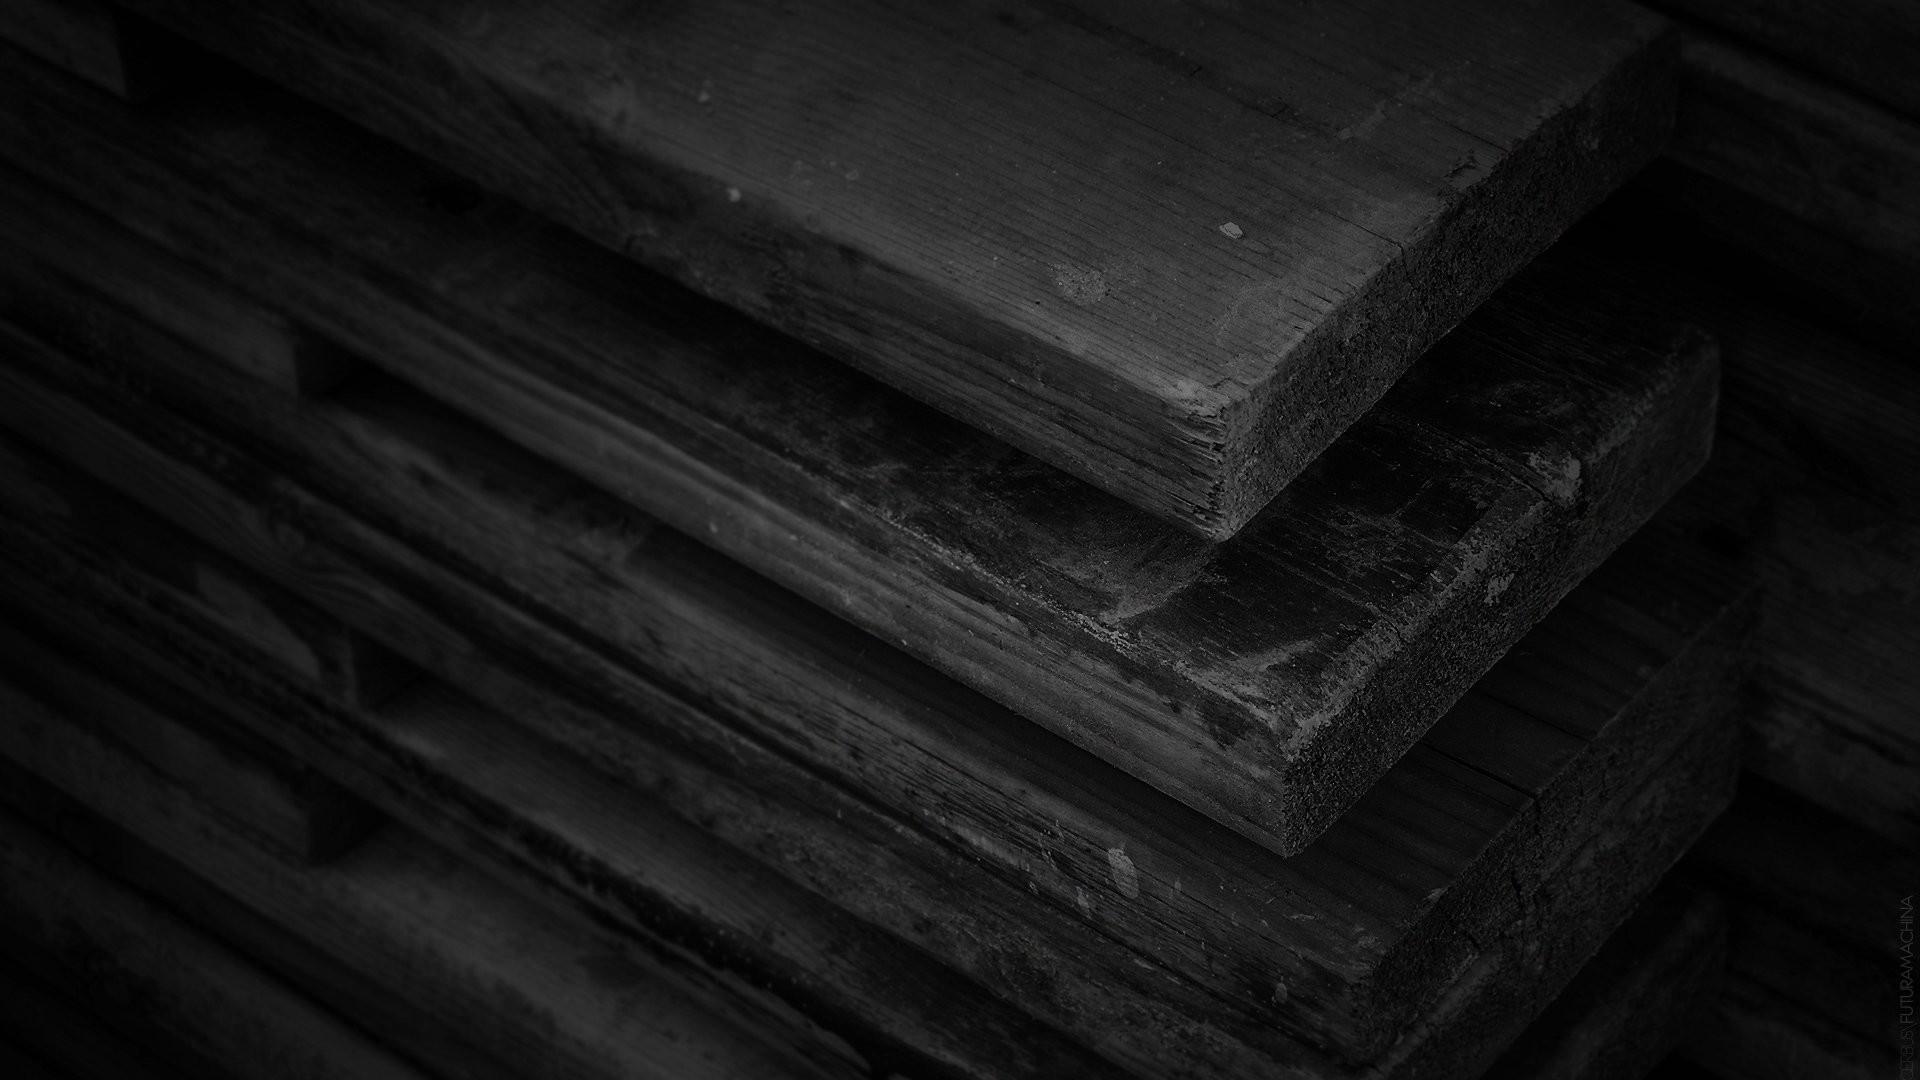 board boards black textures textures wallpaper hd wood wood black color